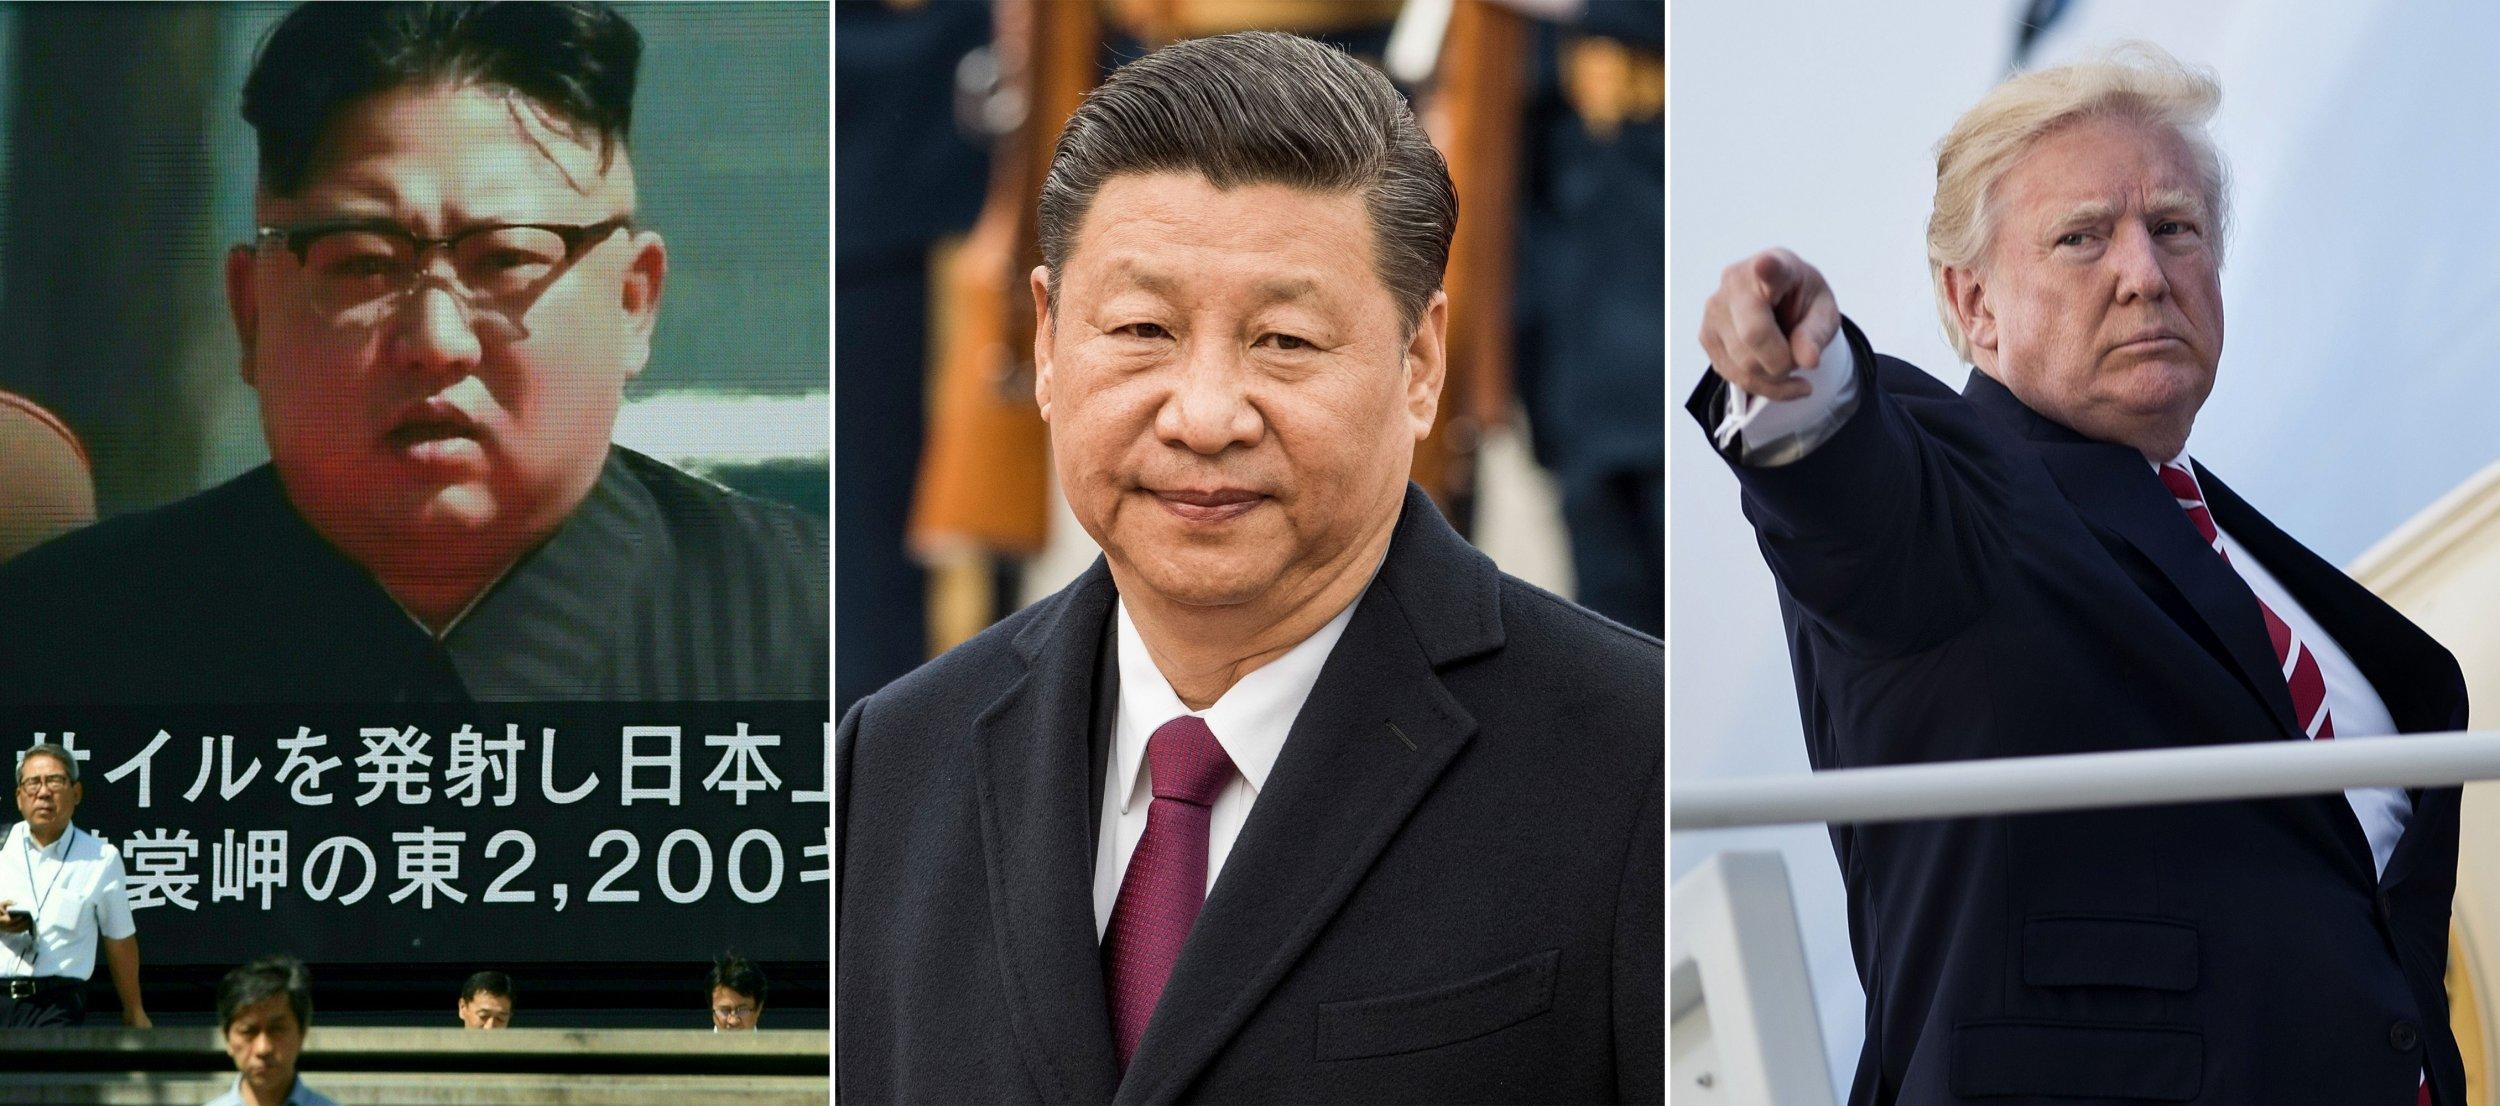 10_26_Trump_Kim_Jong_Un_Xi_Jinping